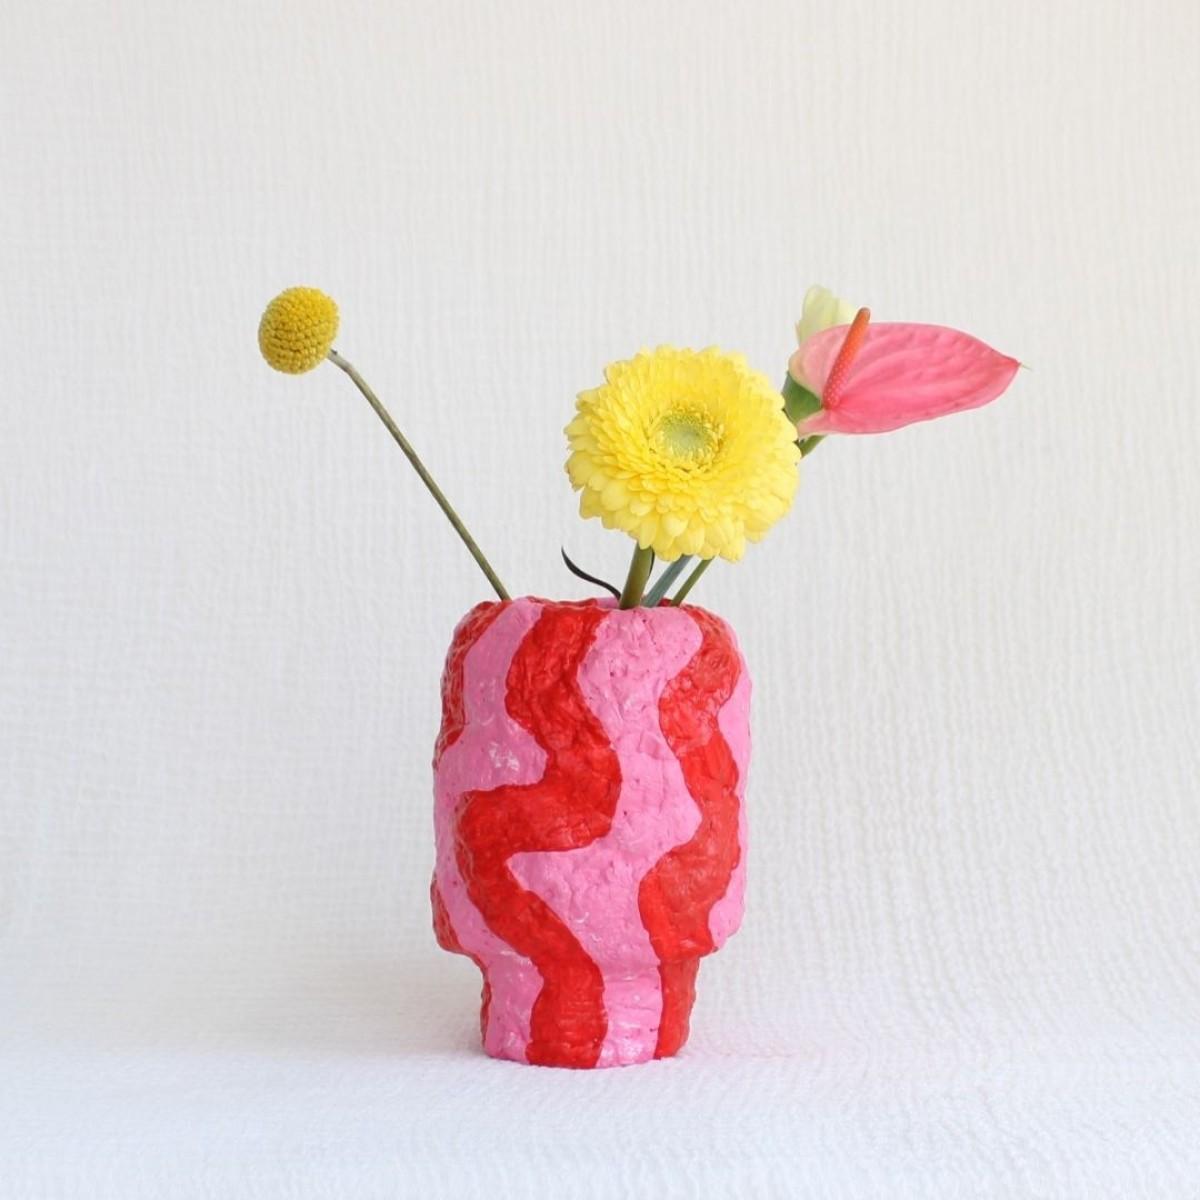 Catchup Studios - nachhaltige Vase - Red Waves Vase